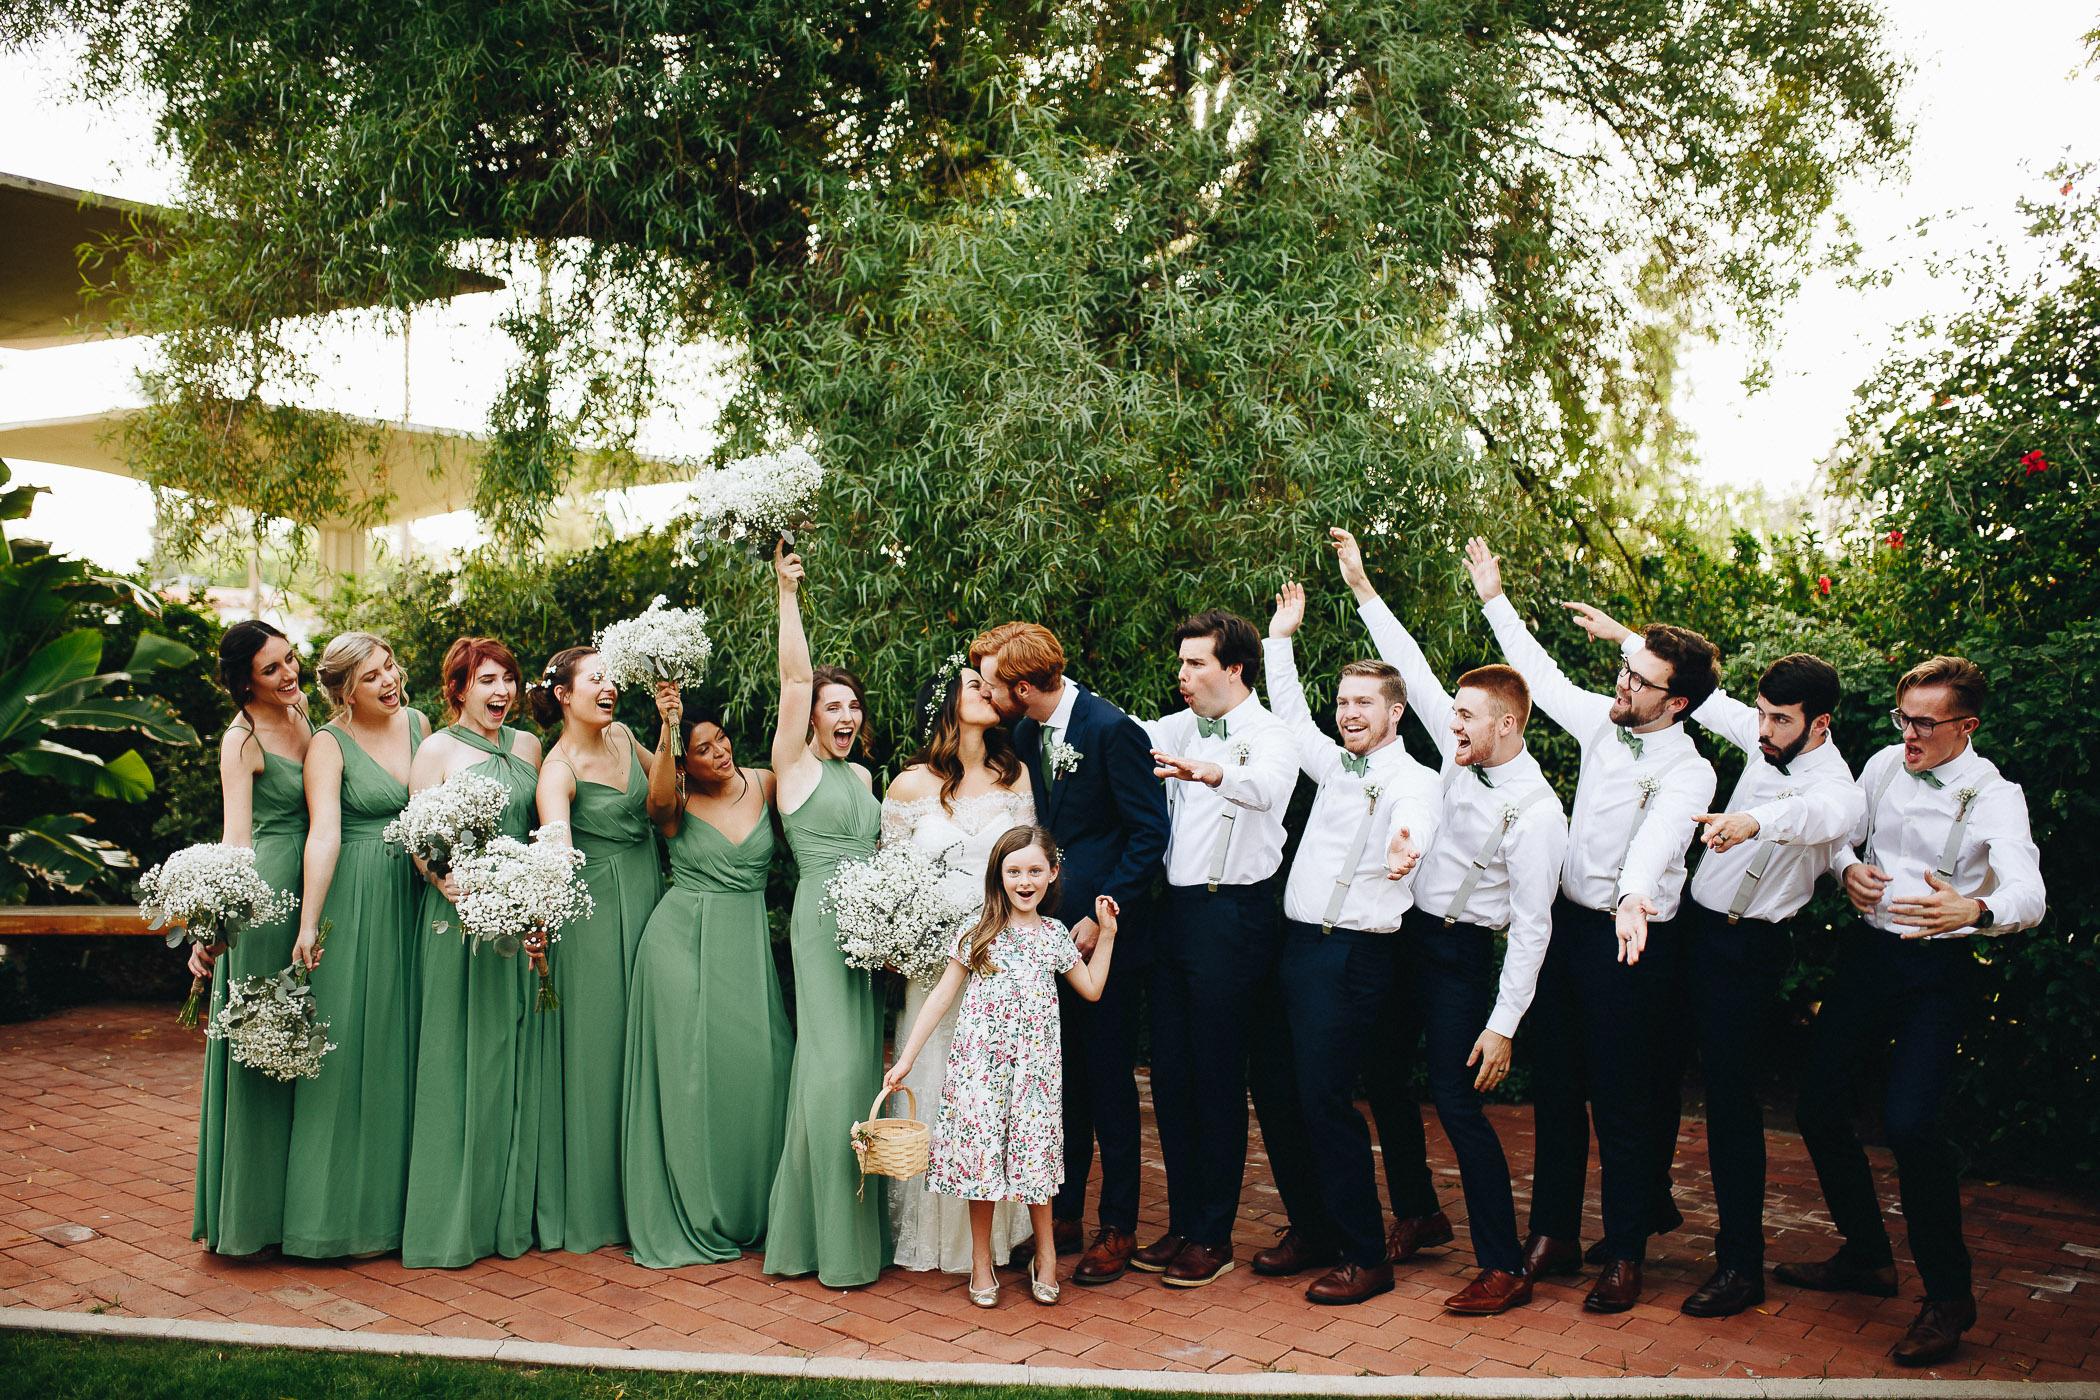 181104-Luxium-Weddings-Arizona-@matt__Le-Brandon-Kariana-Phoenix-Valley-Garden-Center-1084.jpg